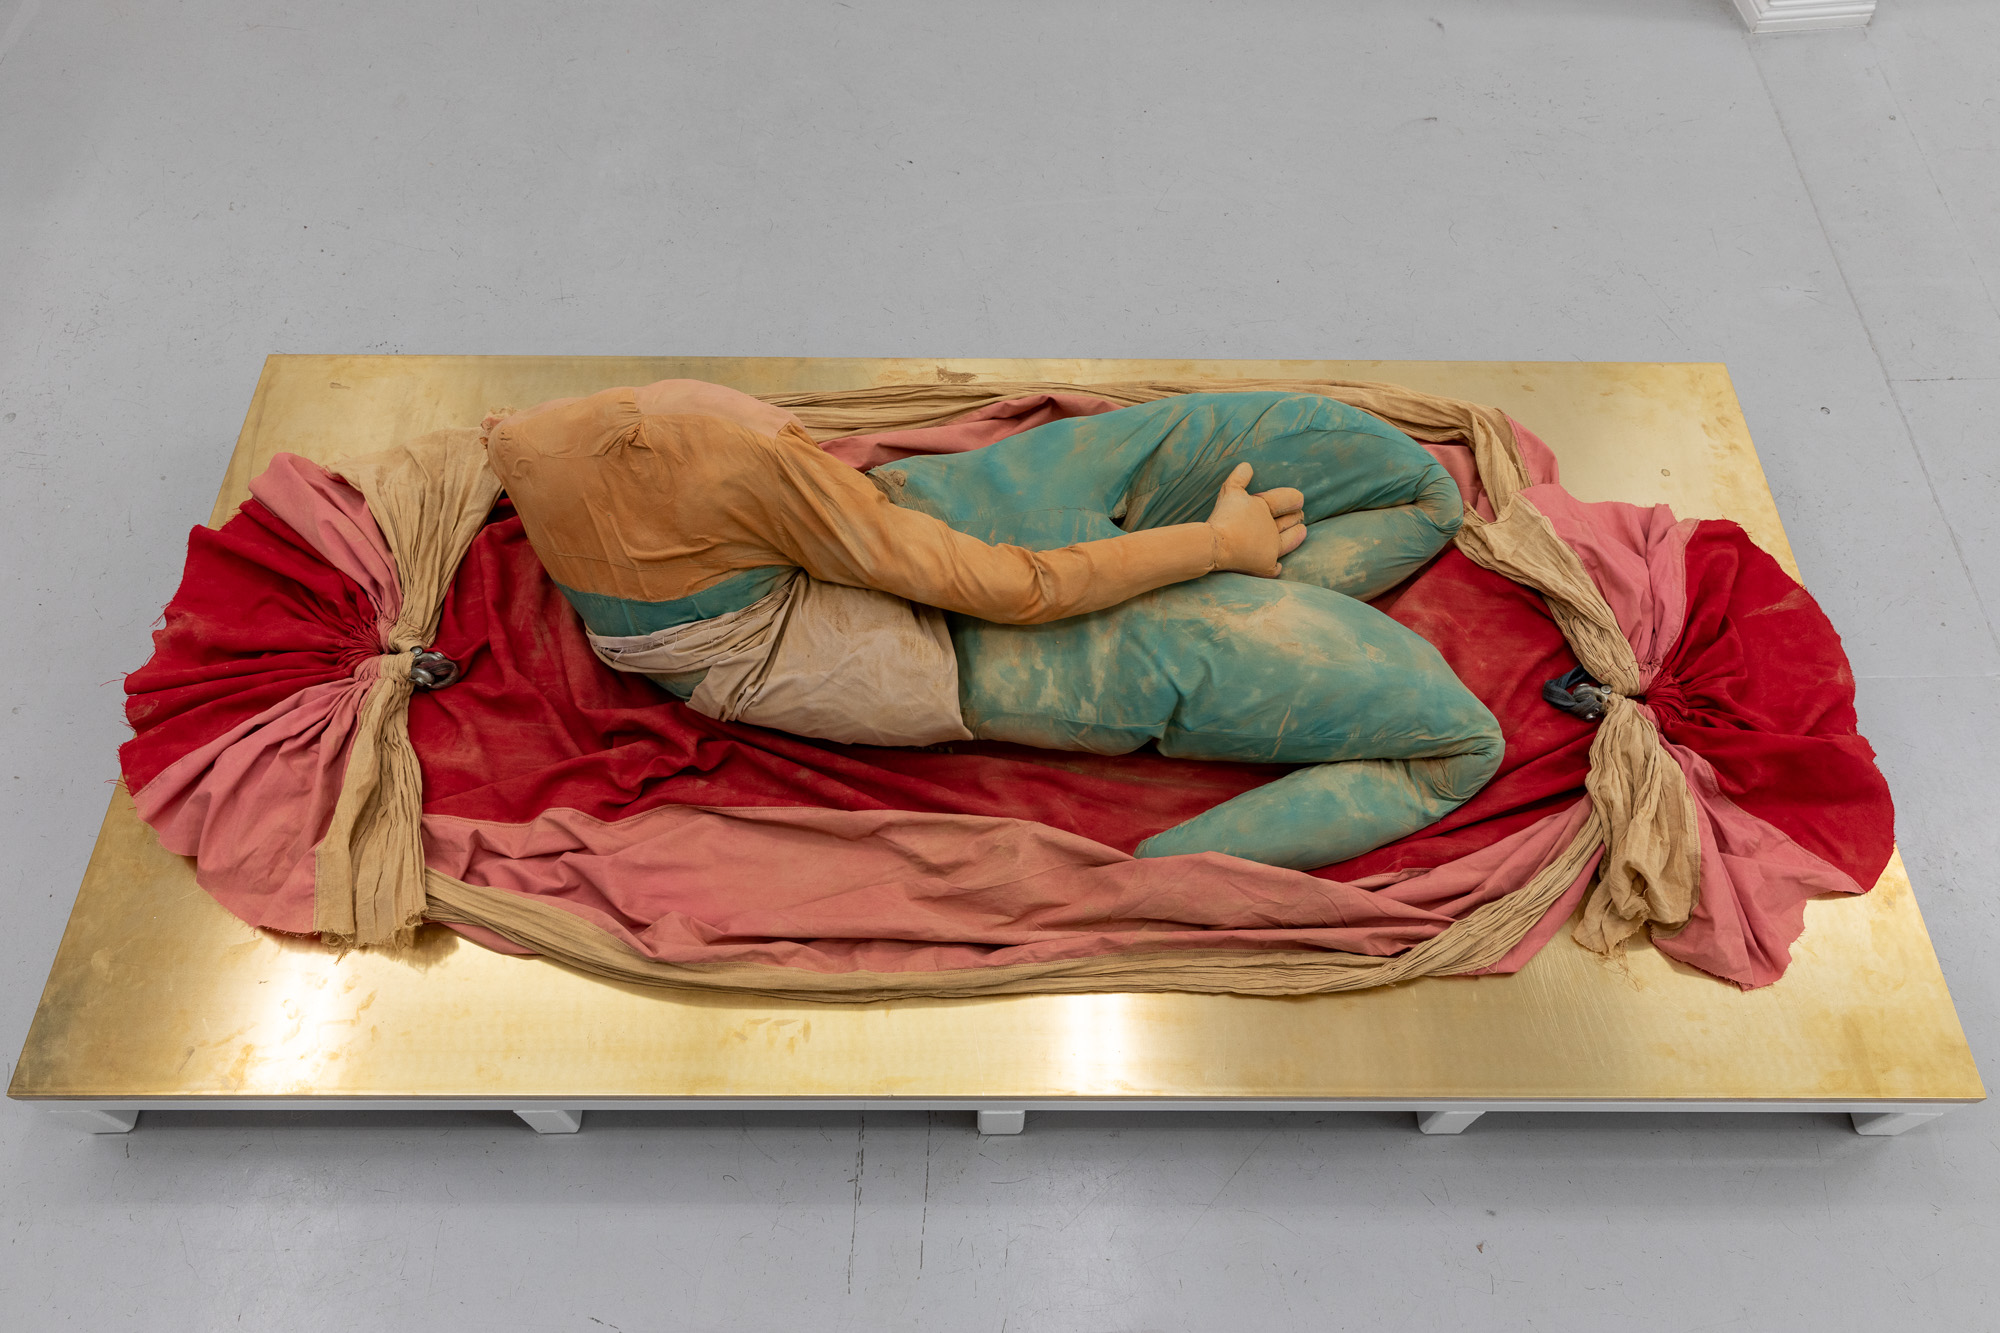 Palett Diva, 2020, Mixed media (textile, clay, powder-coated steel, brass, plywood) on artist designed pedestal, 54 x 100 x 200 cm